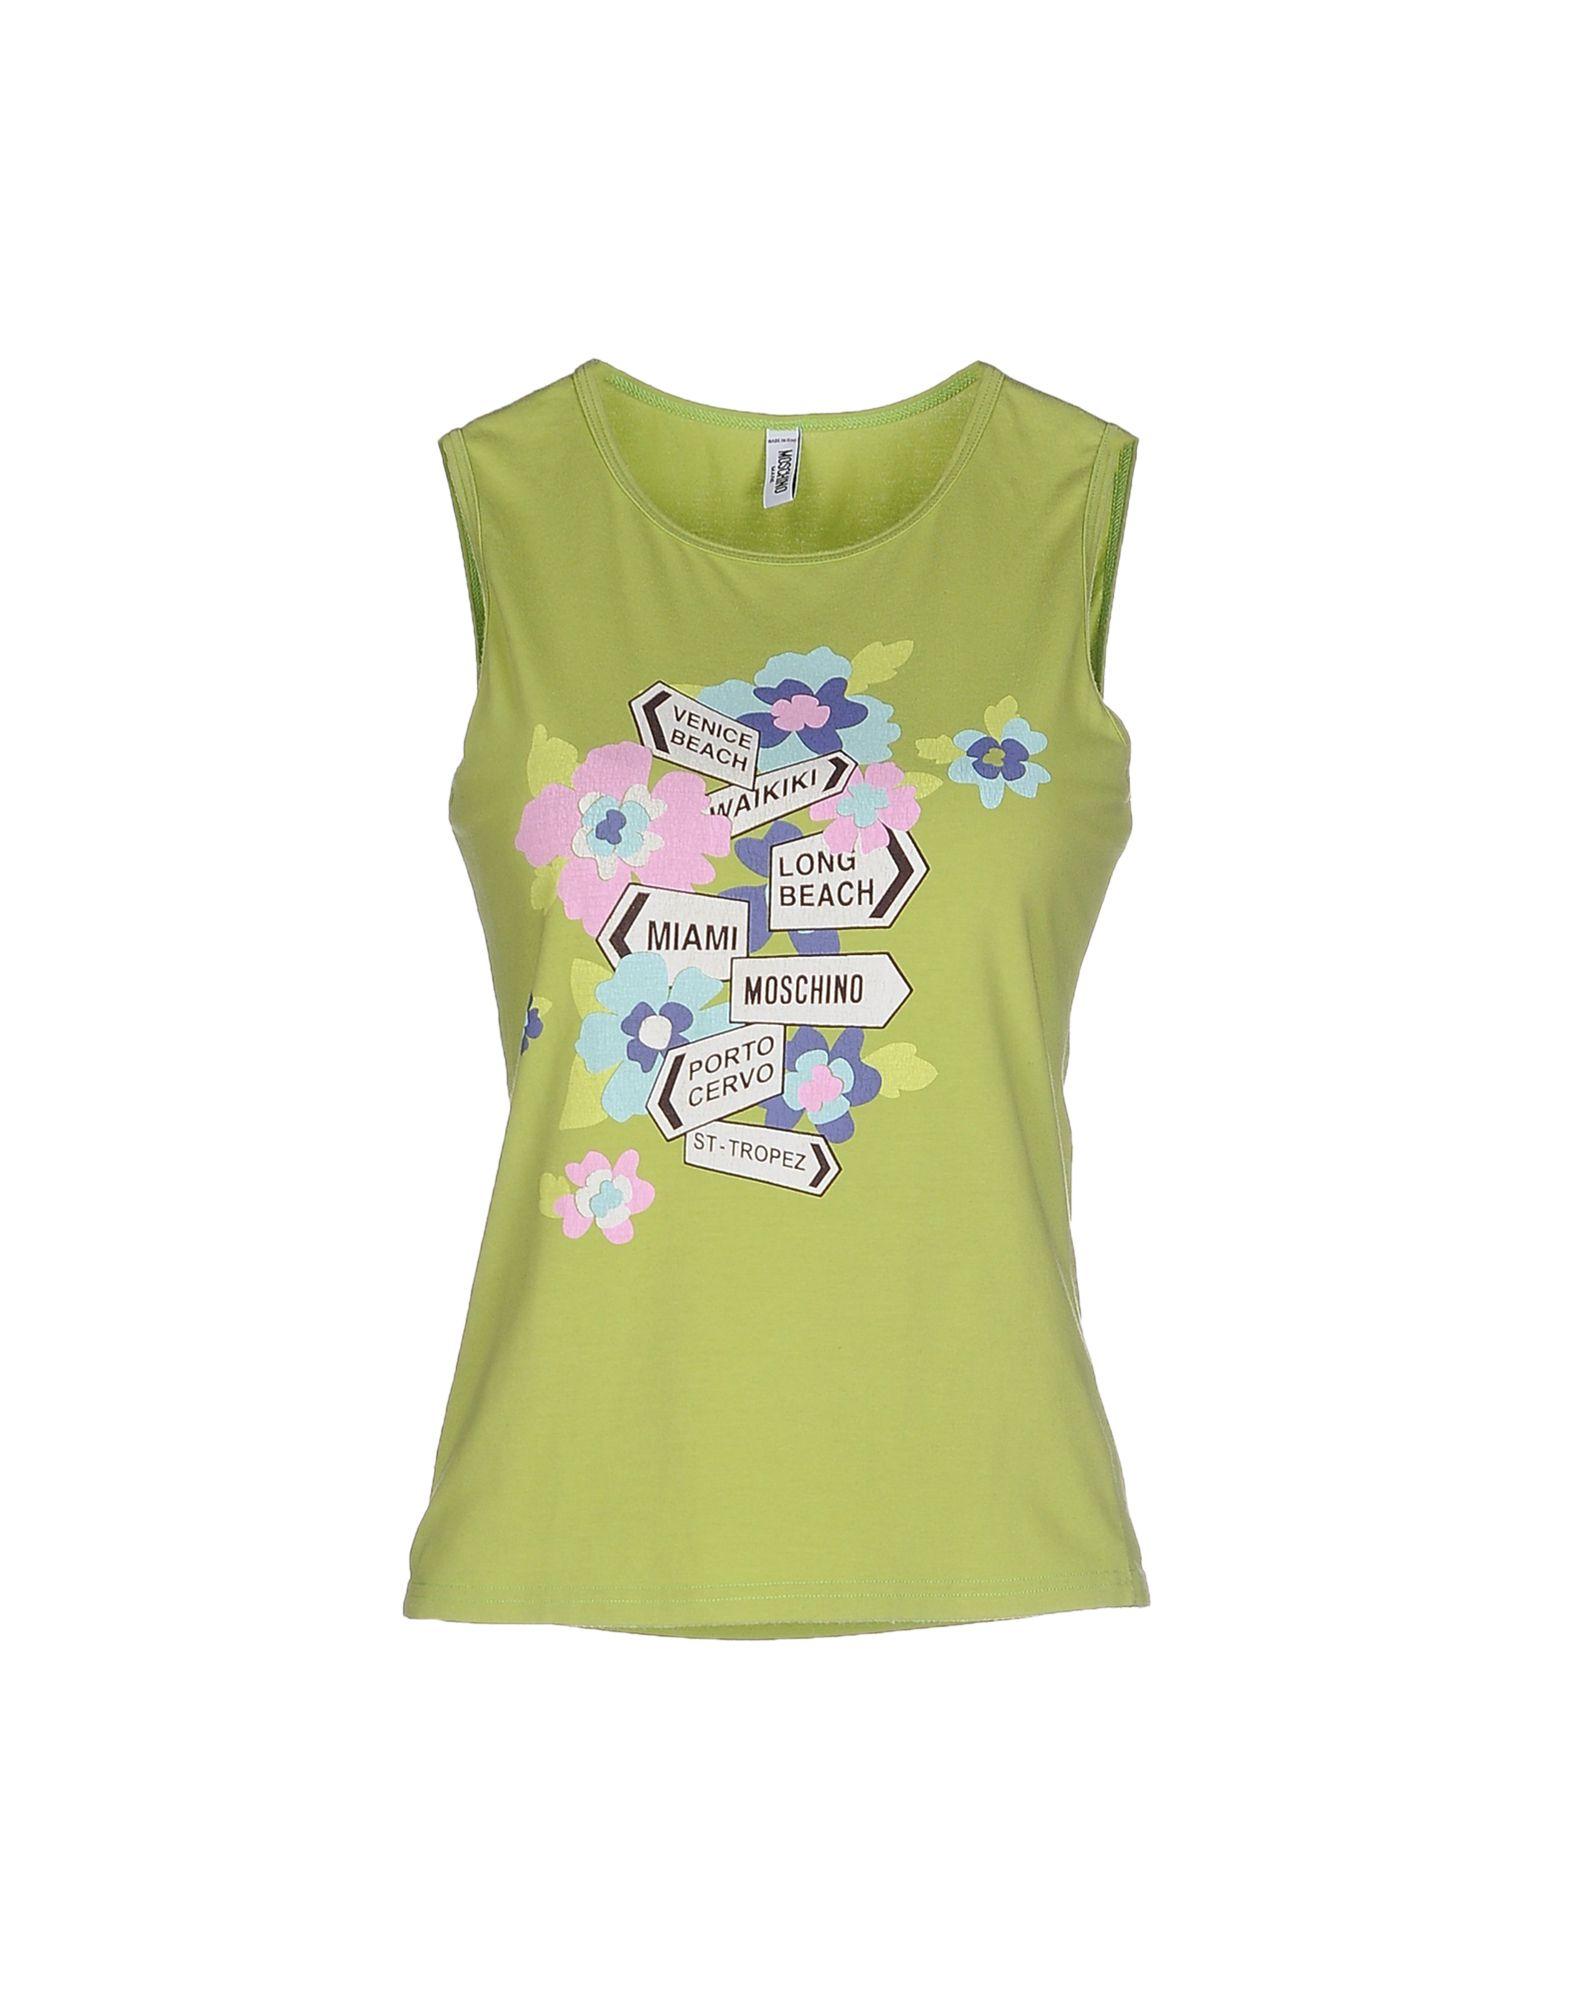 MOSCHINO MARE T-shirts